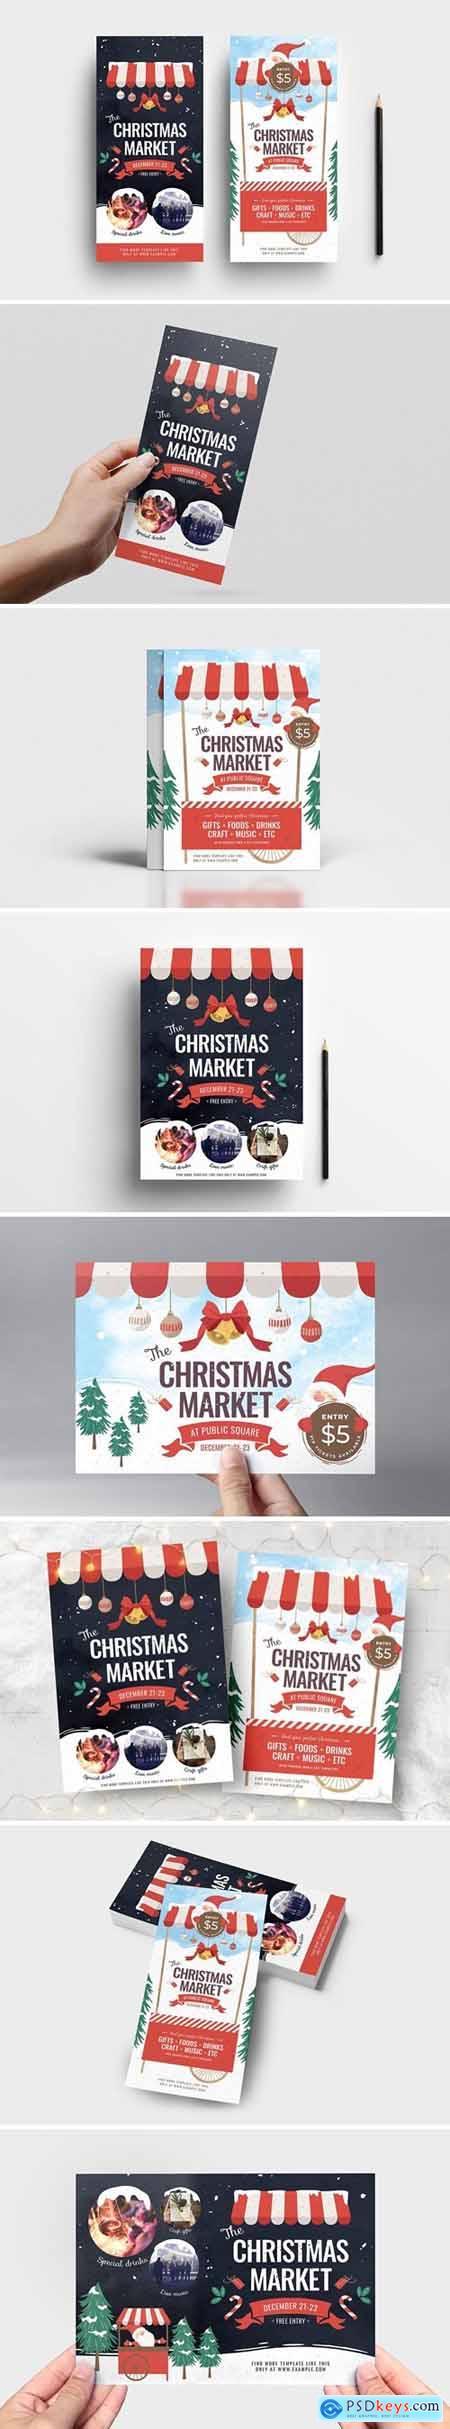 Christmas Market Flyer - Poster Templates